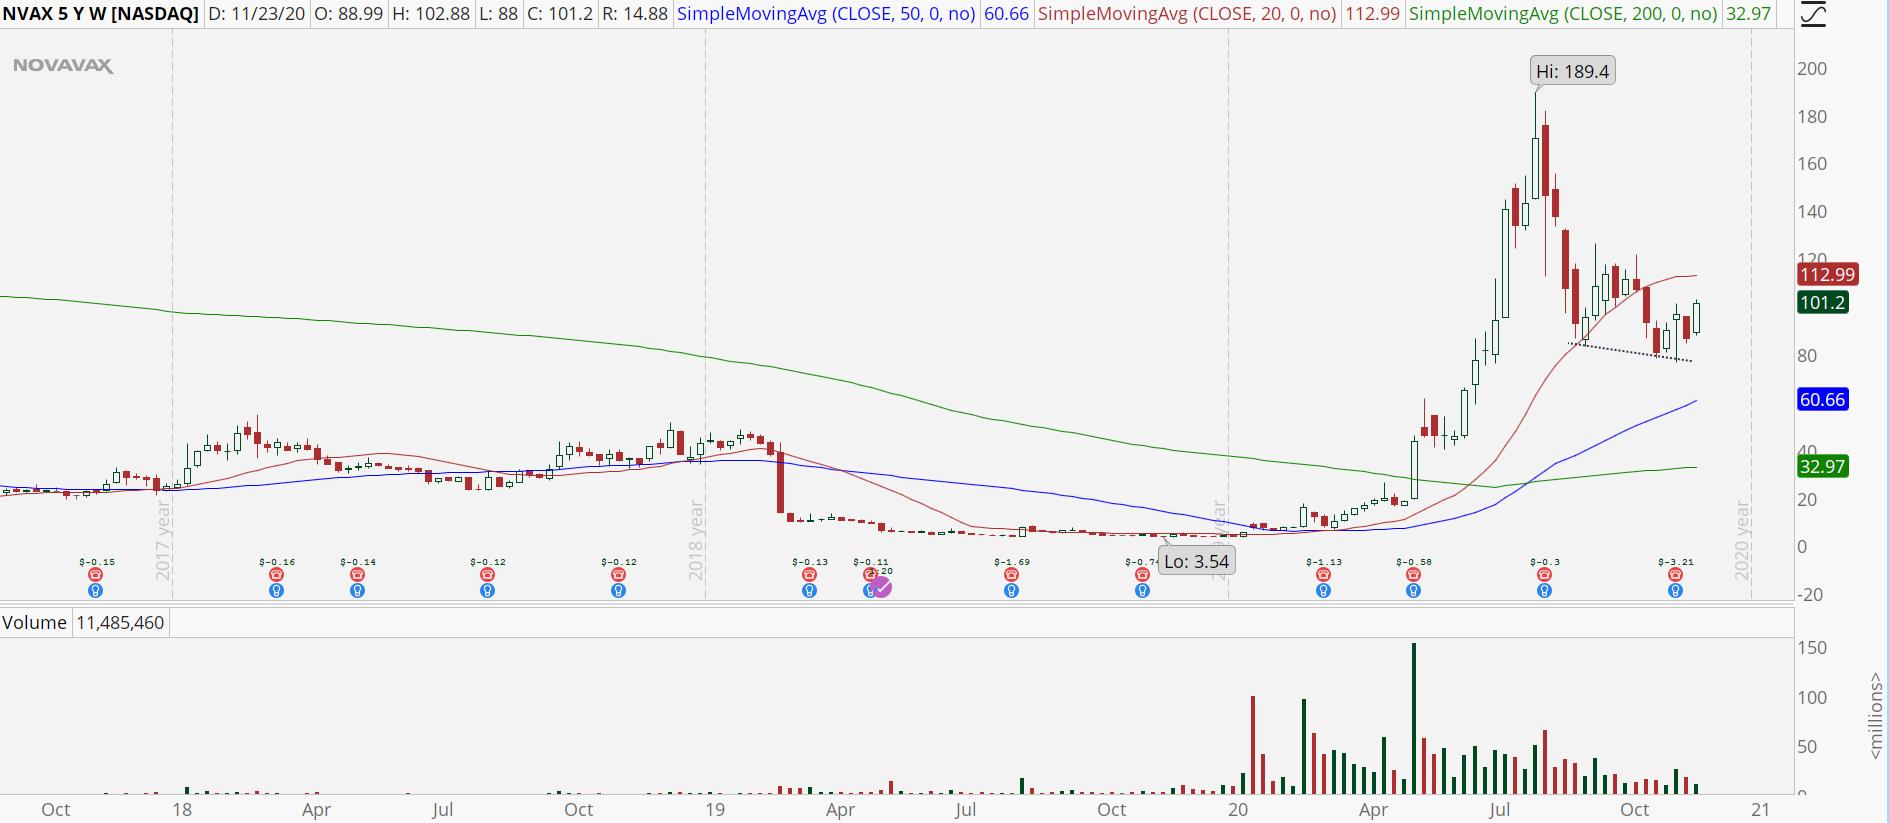 Novavax (NVAX) weekly chart with slowing momentum